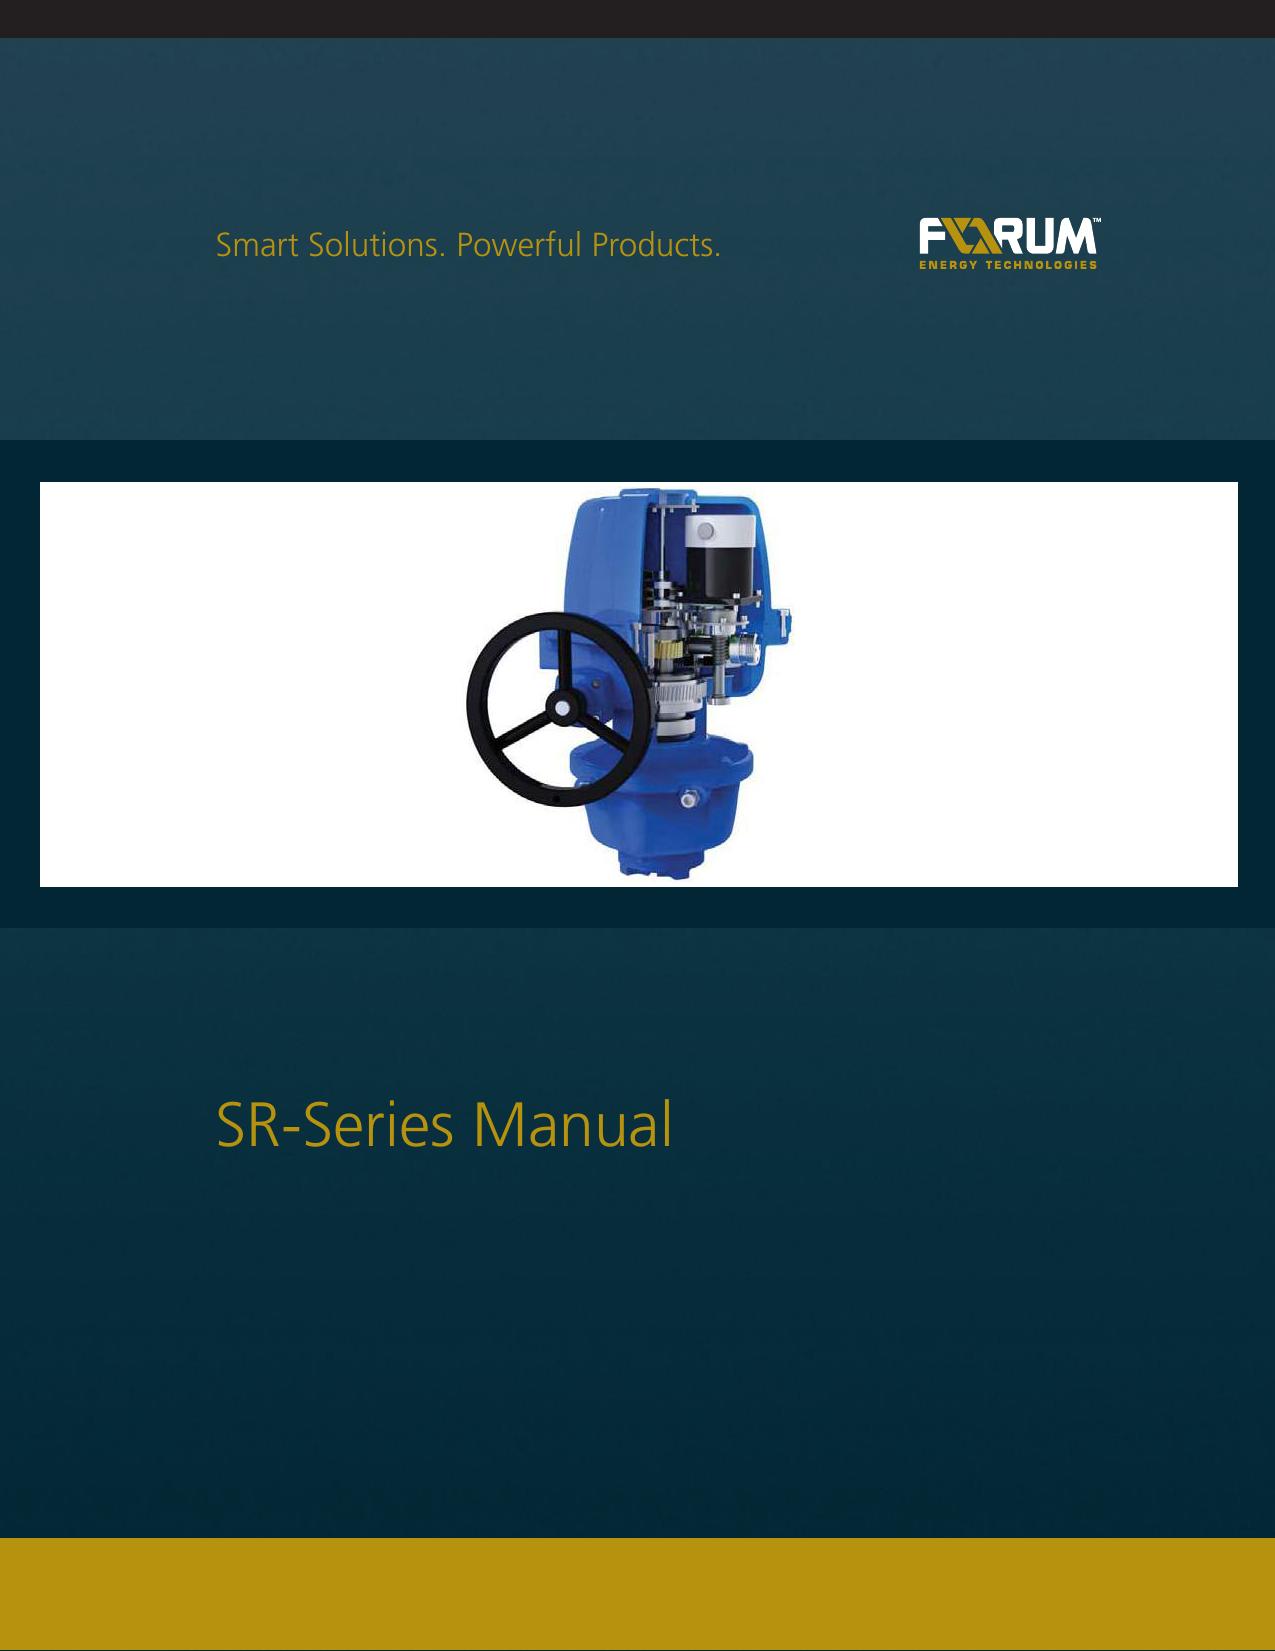 [SCHEMATICS_4HG]  SR-Series Manual | Manualzz | Abz Electric Actuator Wiring Diagram |  | manualzz